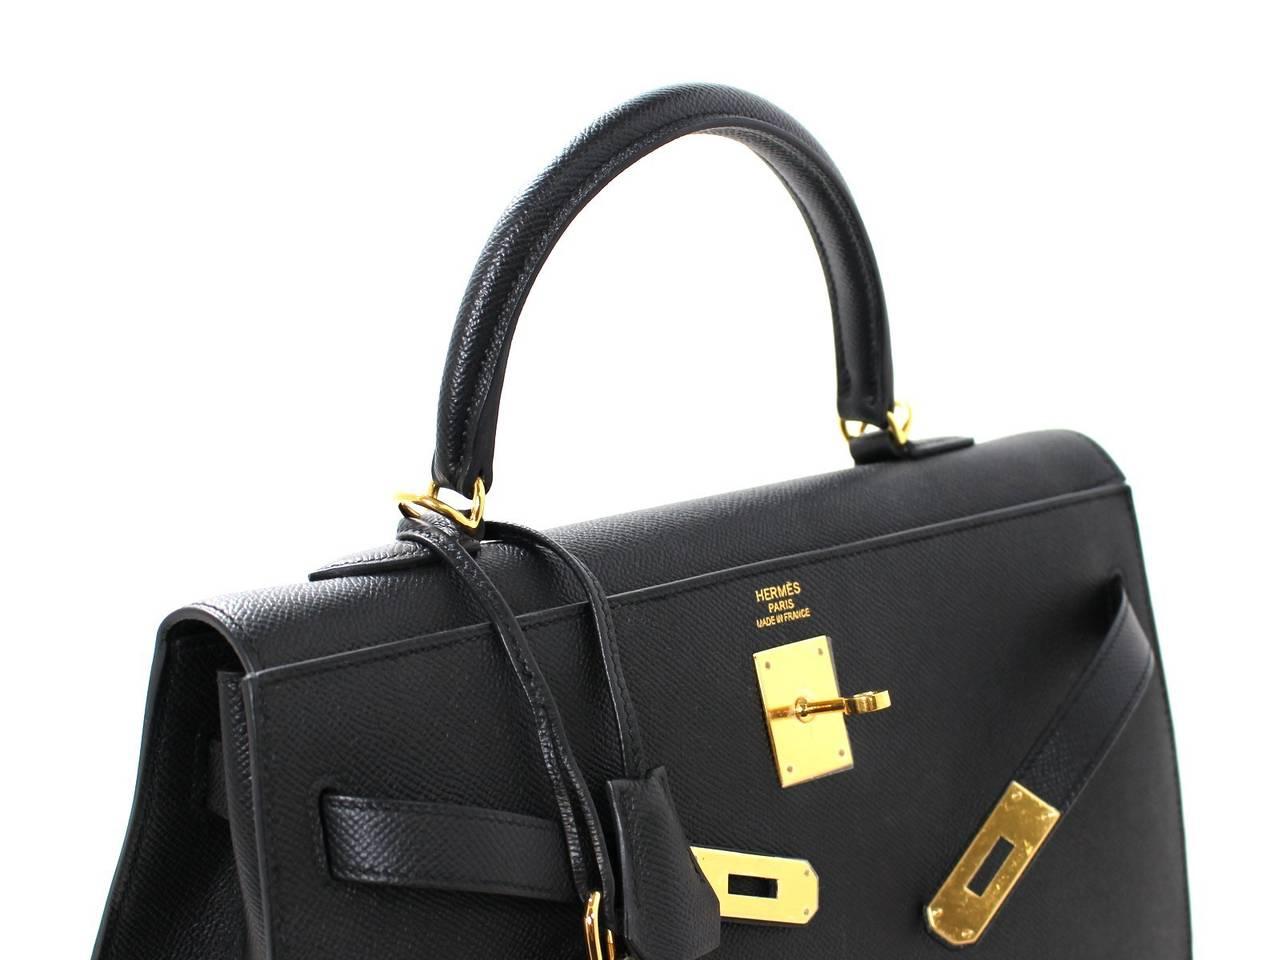 Hermes Black Kelly Sellier- Epsom Leather GHW  in 35 cm size 6